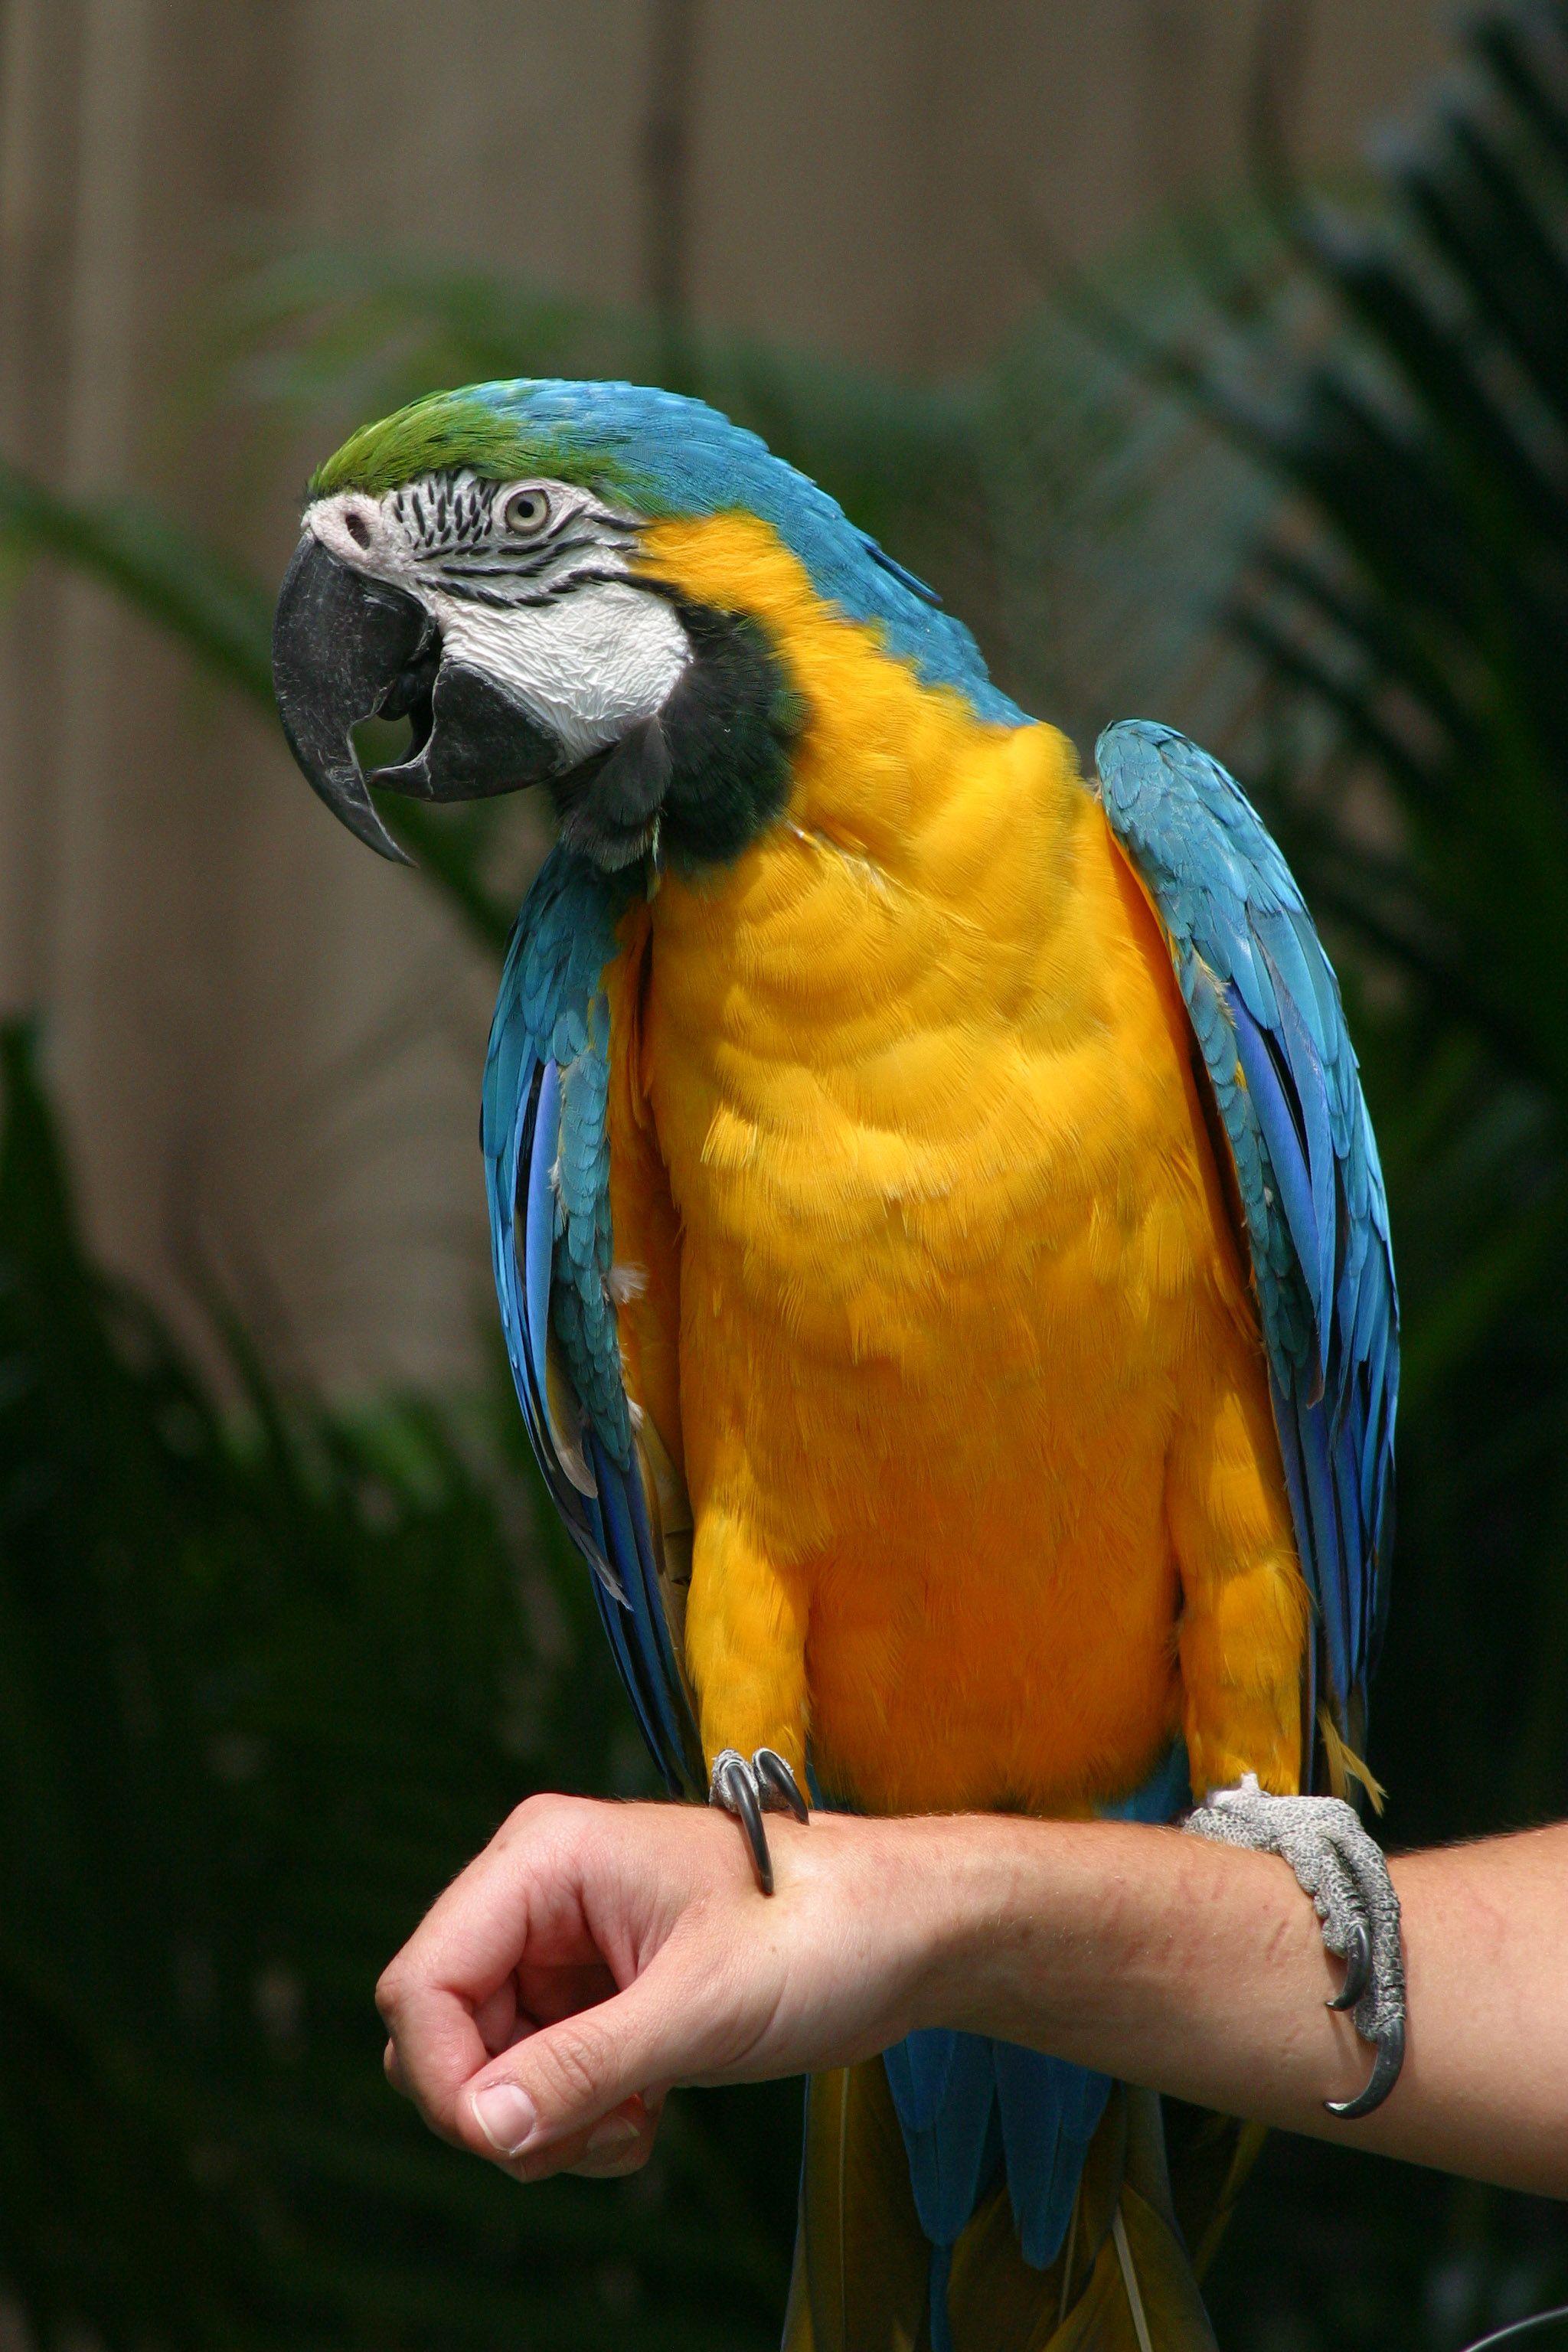 pin blue macaw bird - photo #15